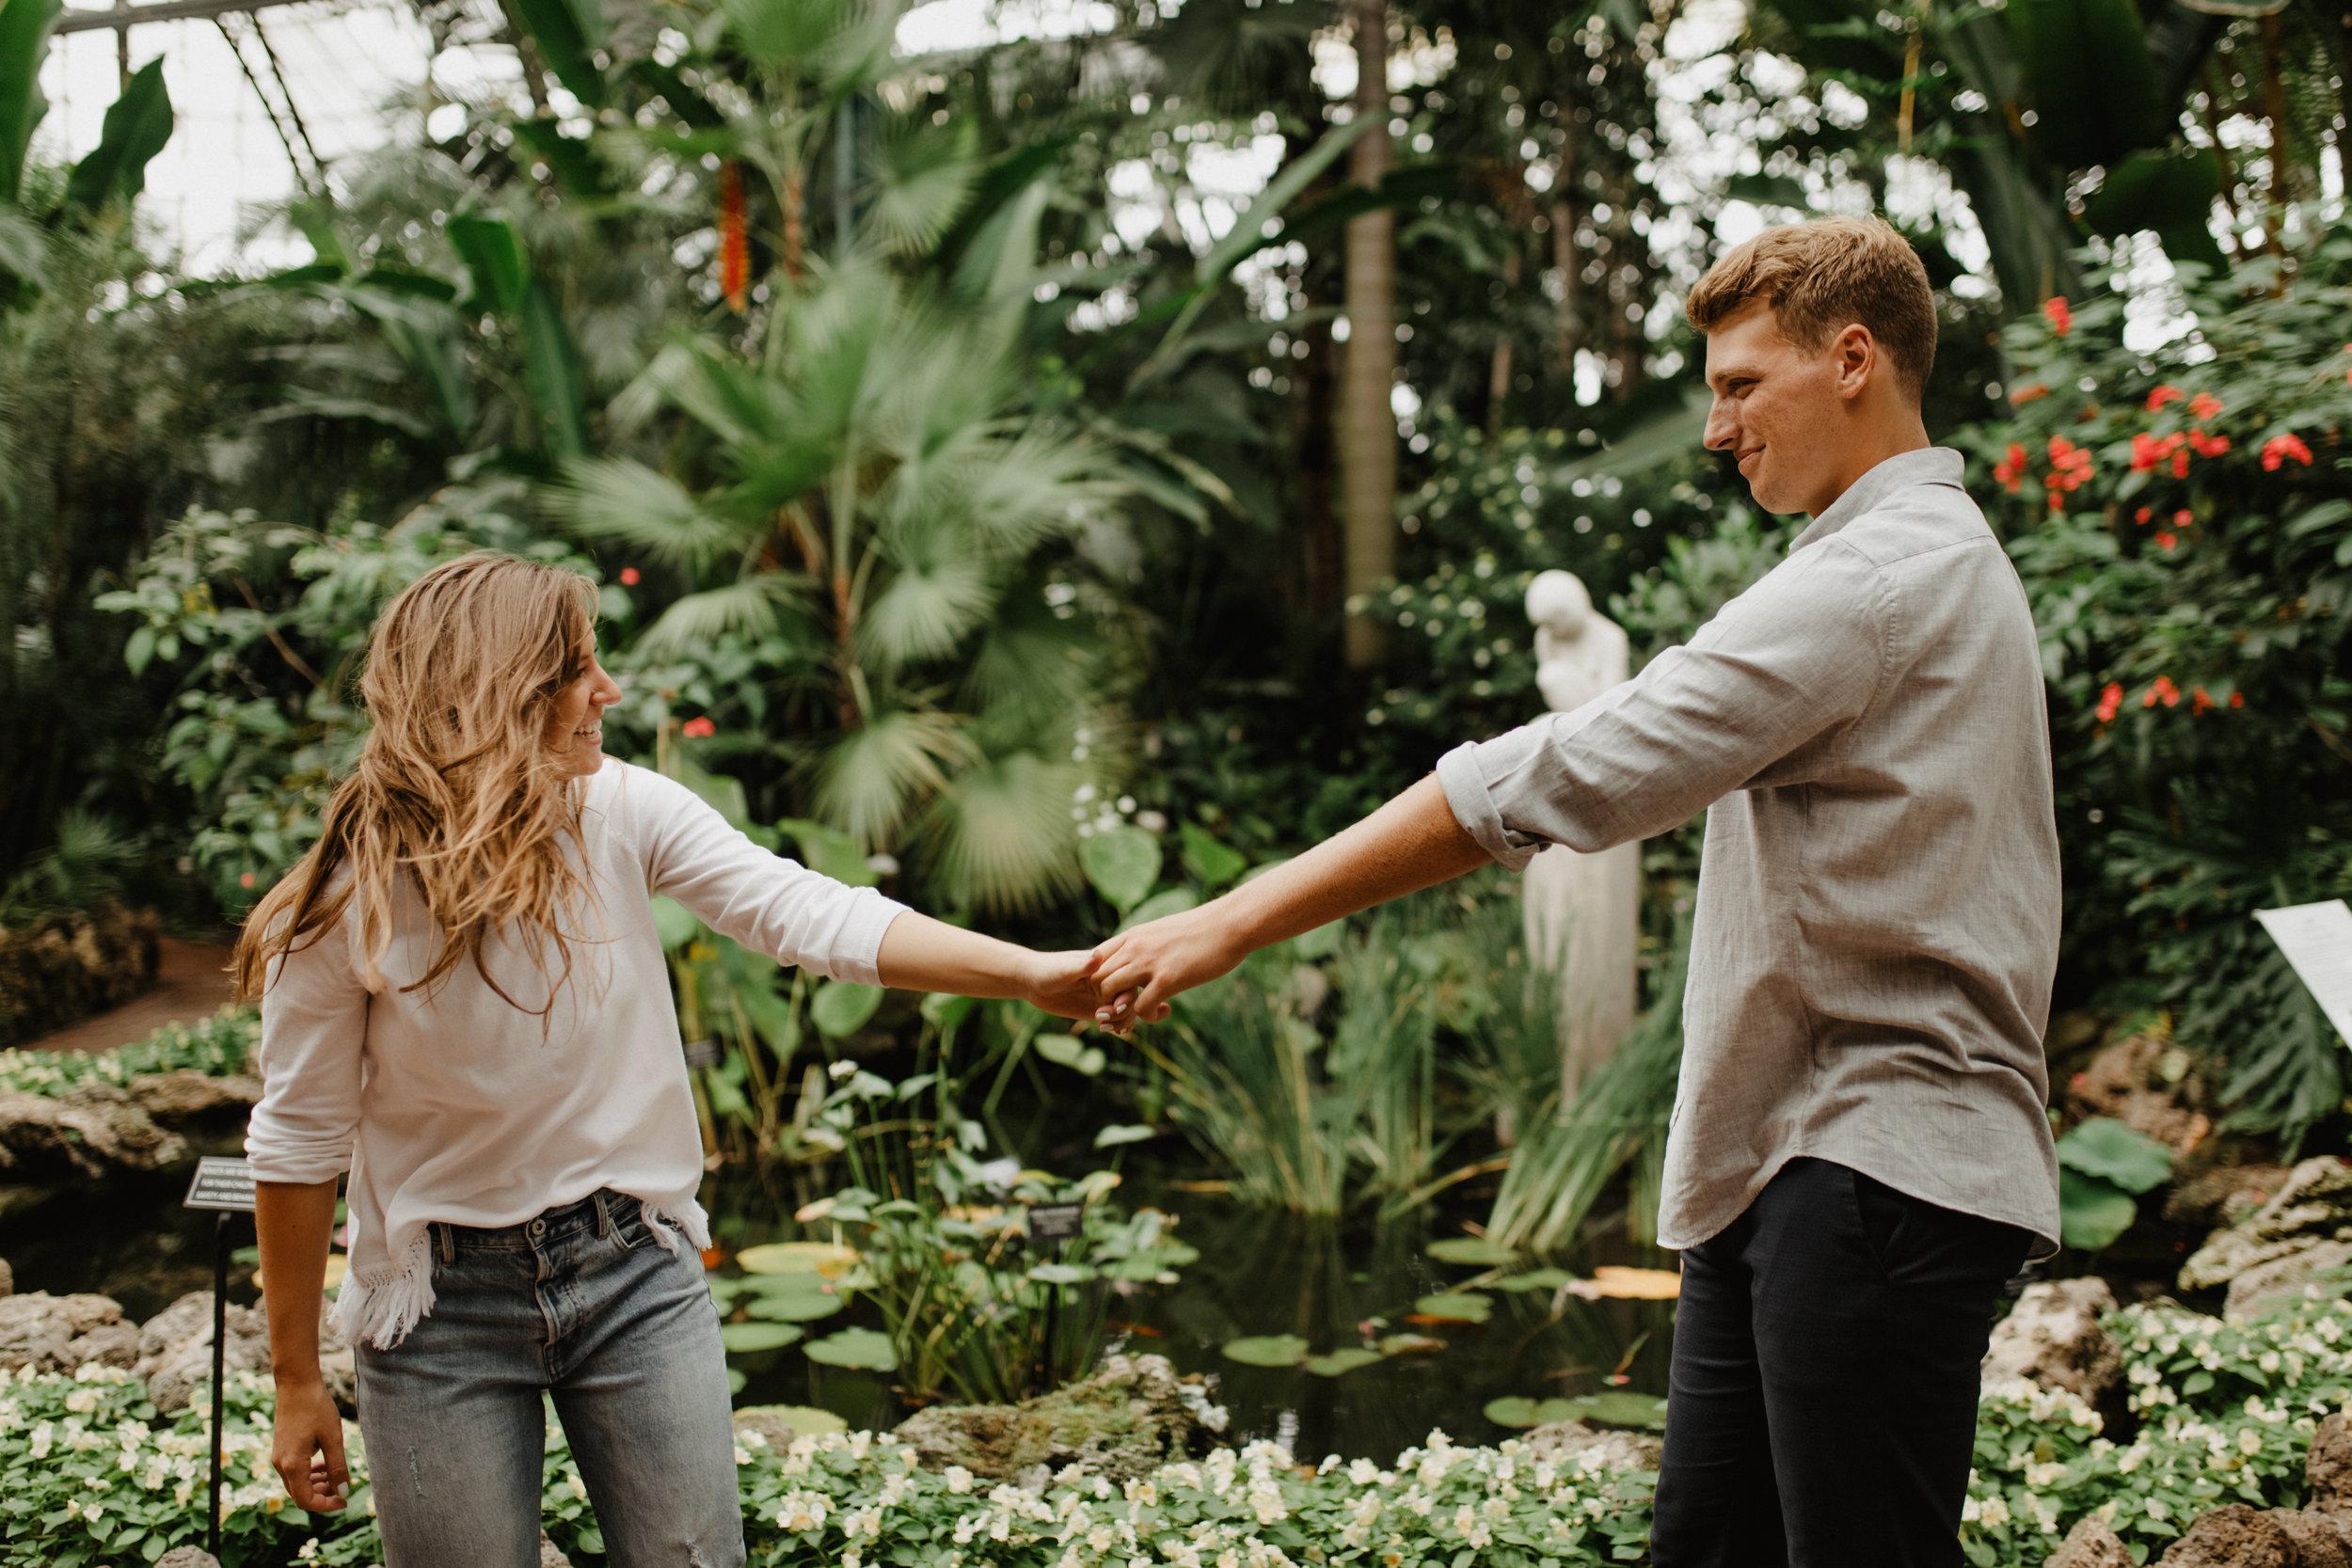 Taryn-Zak-Lincoln-Park-Conservatory-Engagement-30